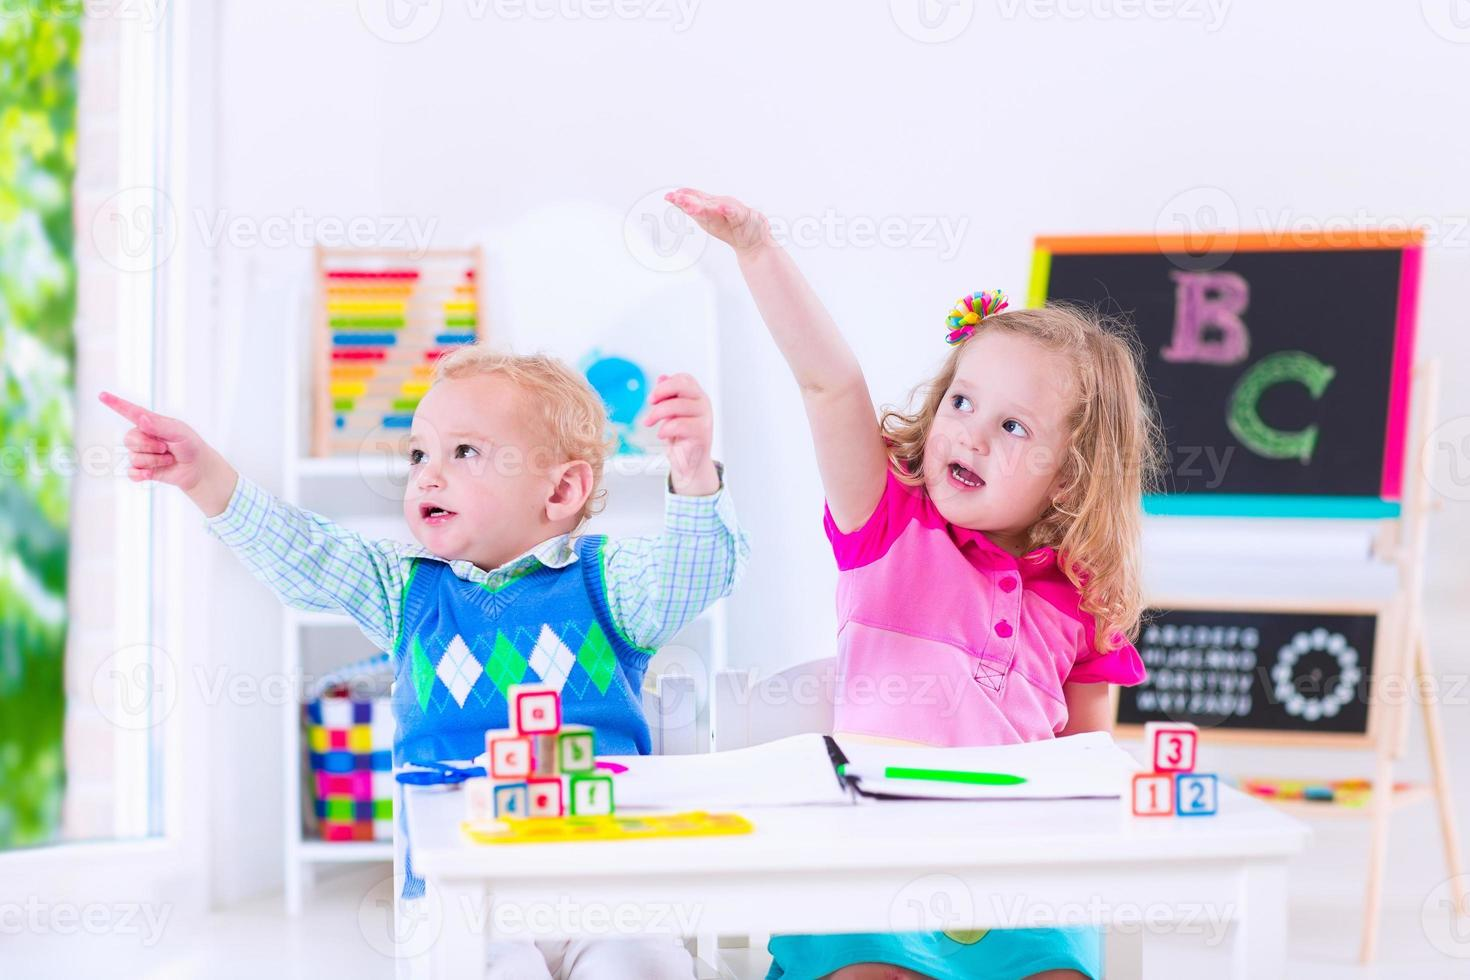 Adorable kids at preschool painting photo